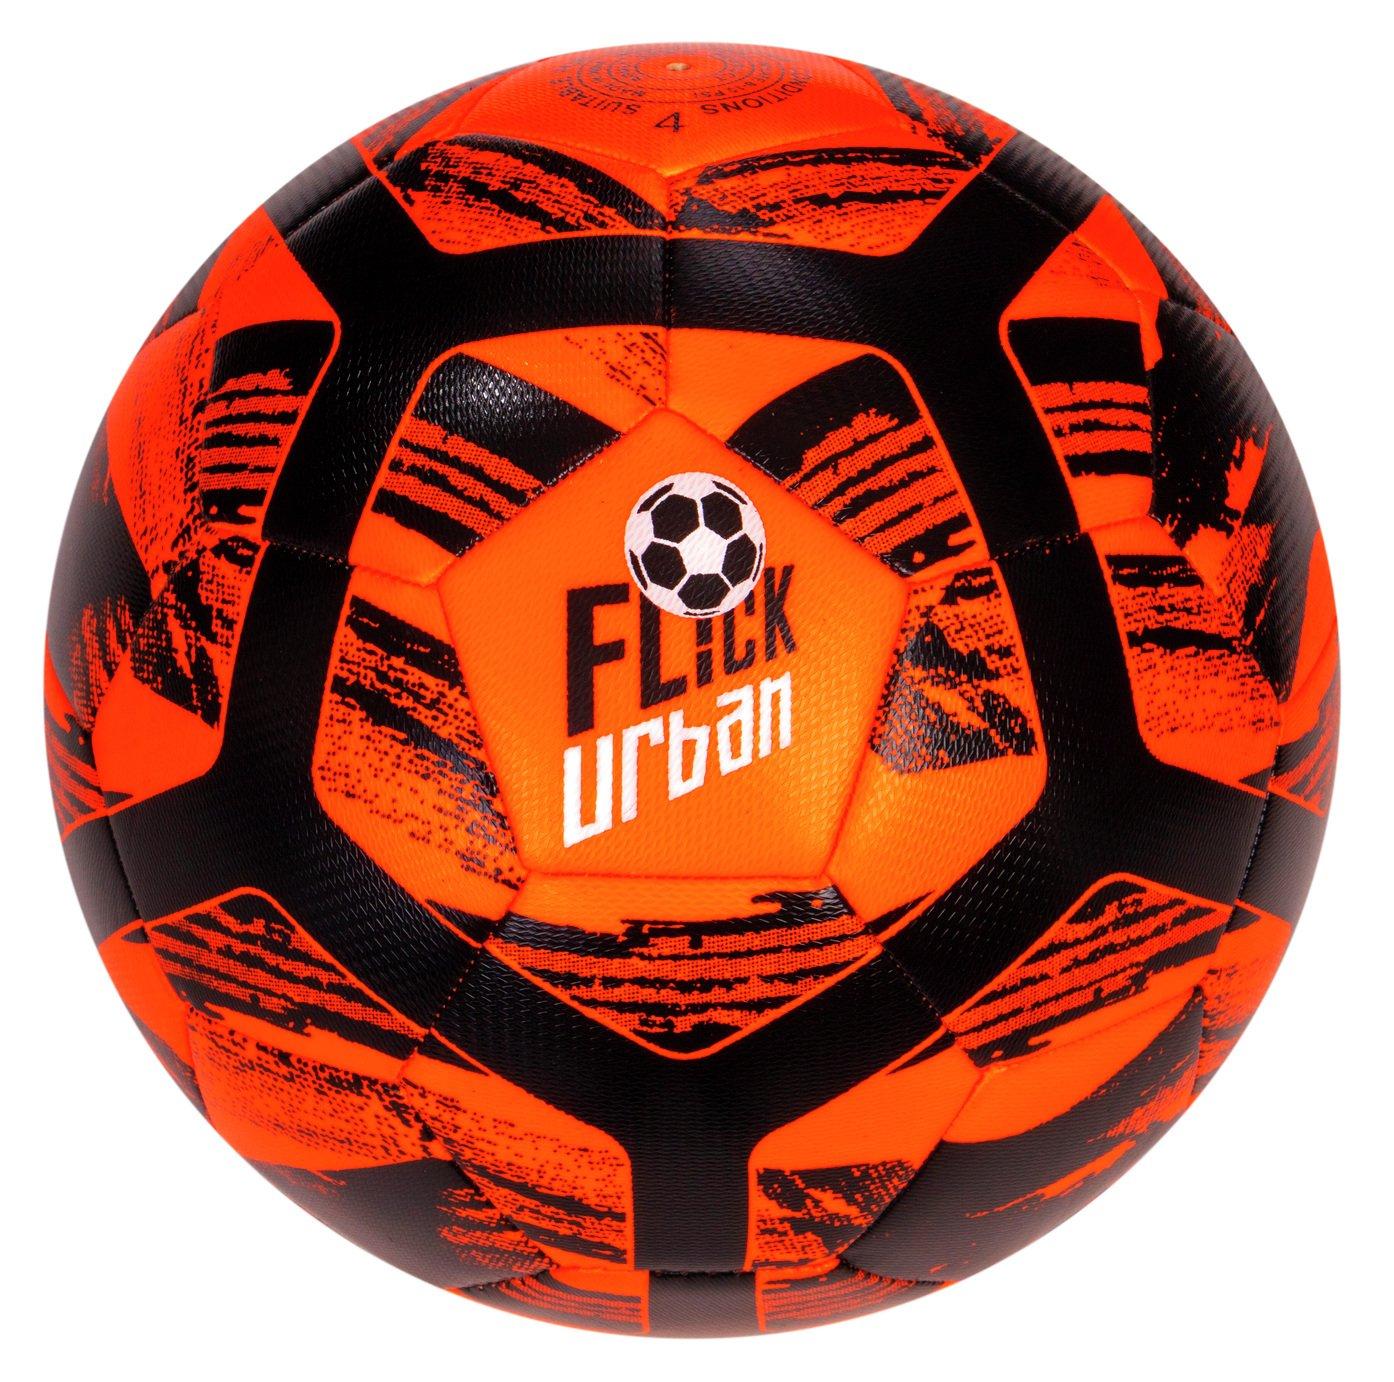 Football Flick Urban Size 4 Football - Orange and Black